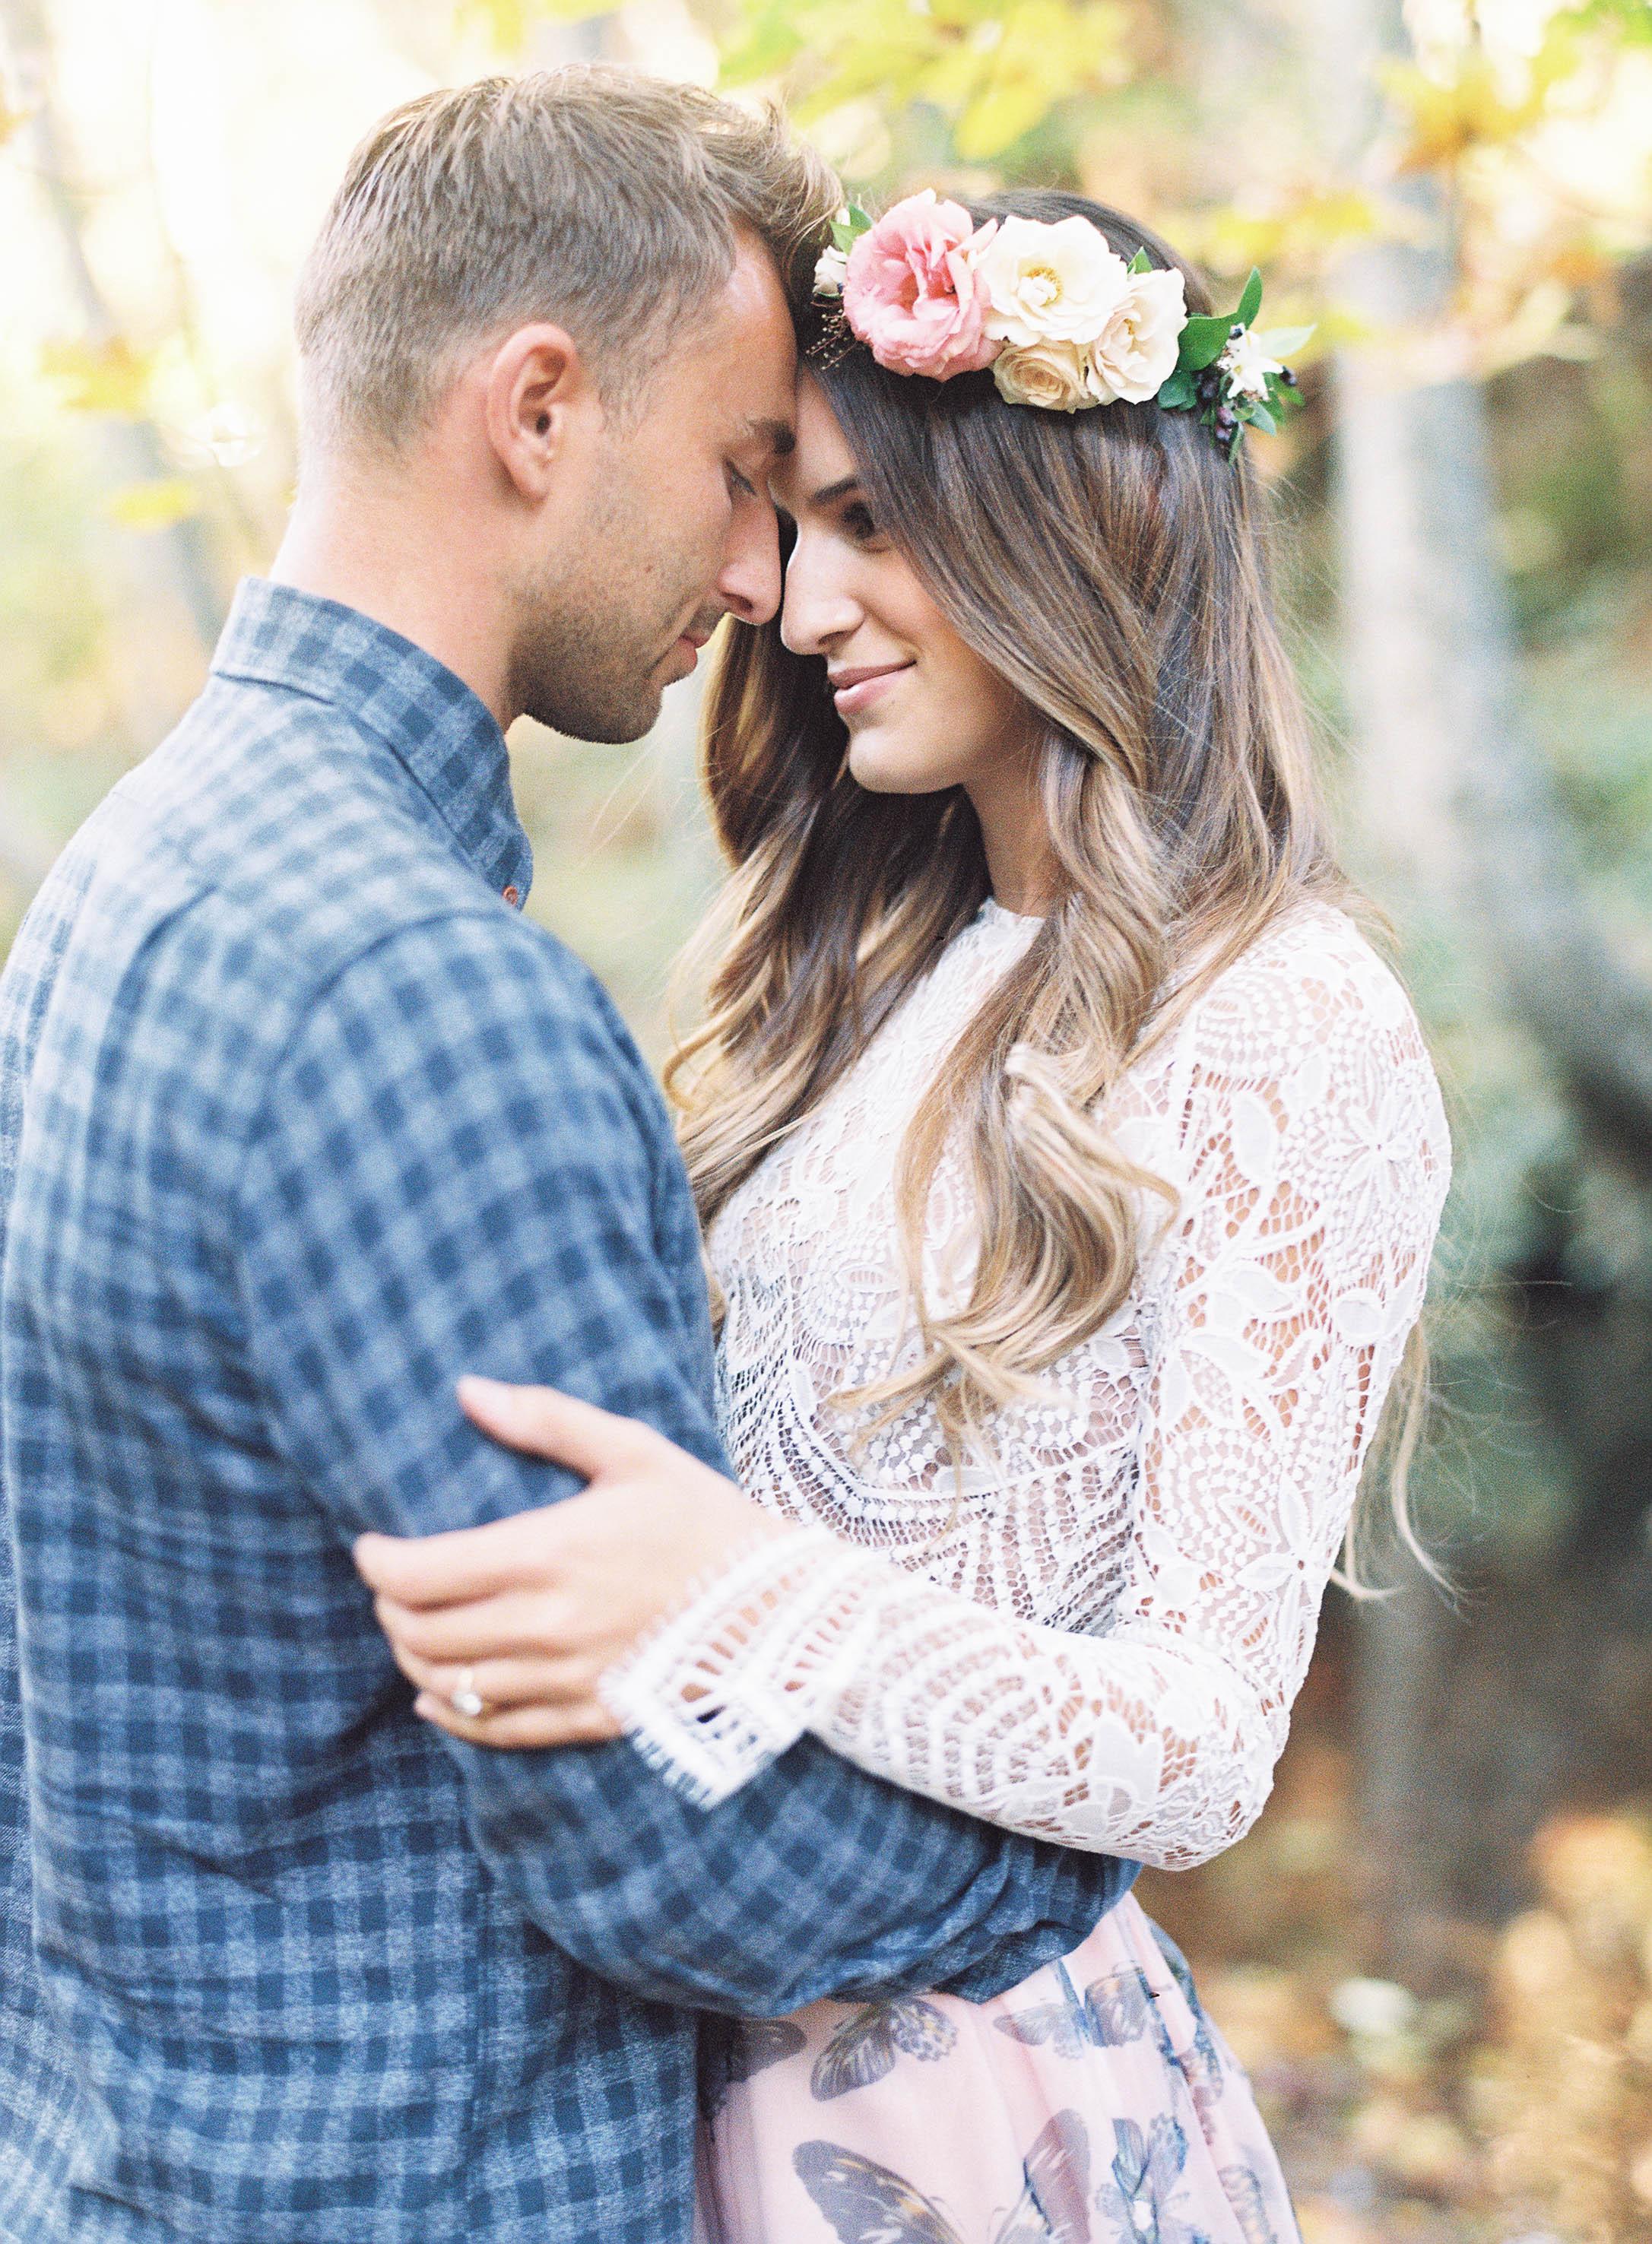 Meghan Mehan Photography - Fine Art Film Wedding Photography - San Francisco | Napa | Sonoma | Big Sur | Chicago | Minneapolis | Milwaukee | Lake Geneva | Door County | Wisconsin 049.jpg